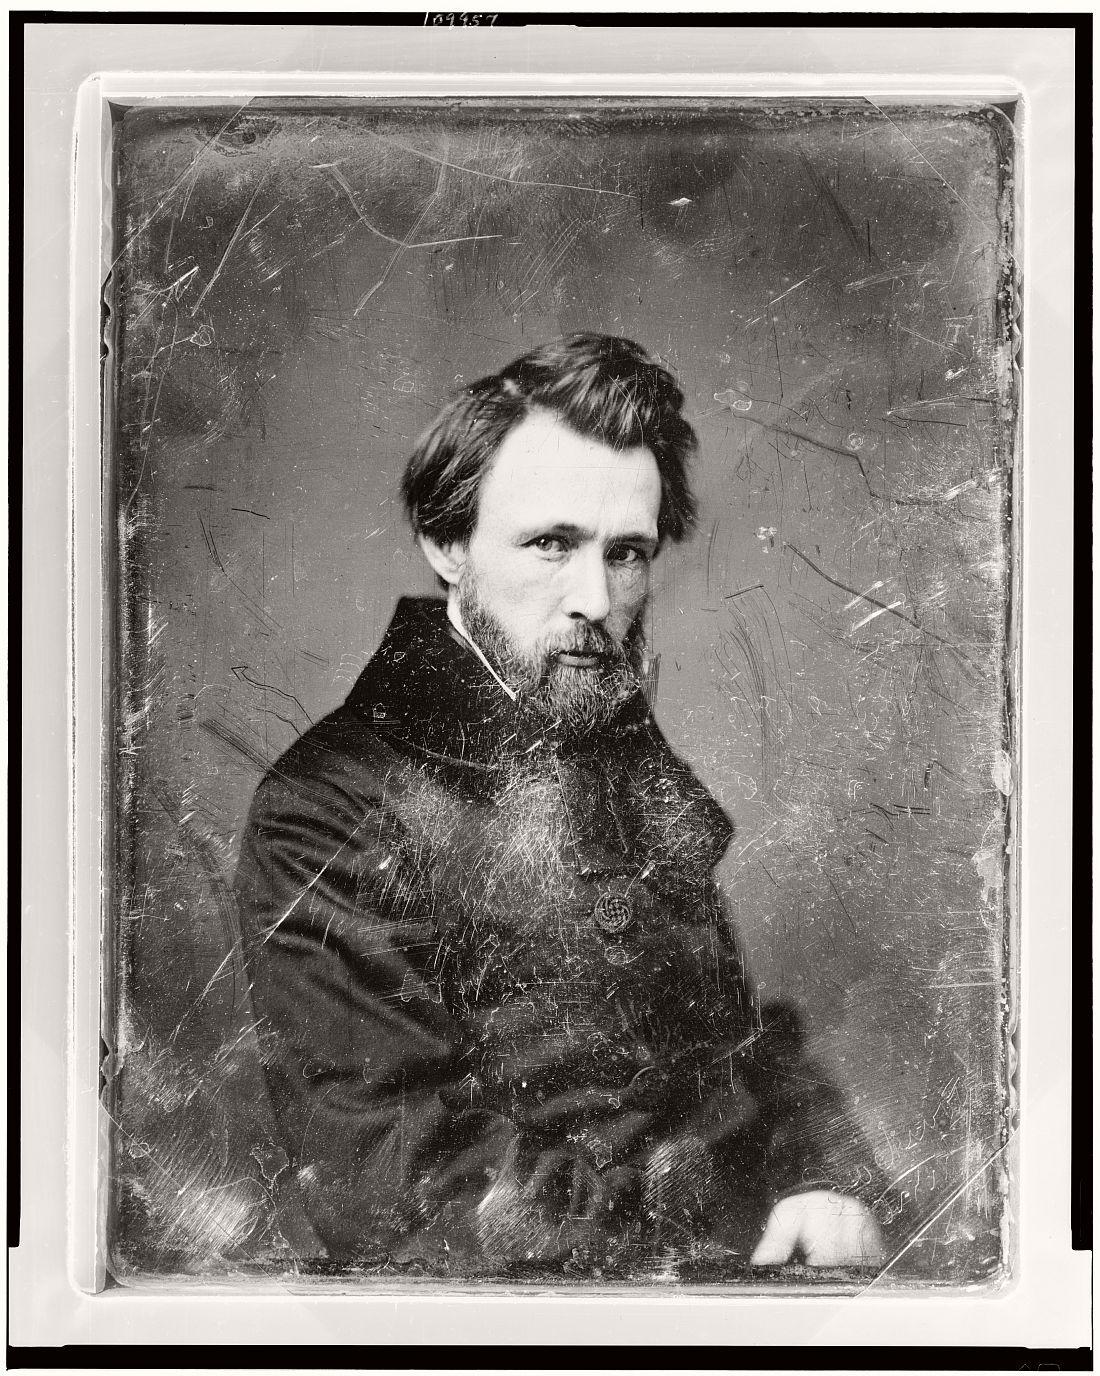 vintage-daguerreotype-portraits-from-xix-century-1844-1860-34